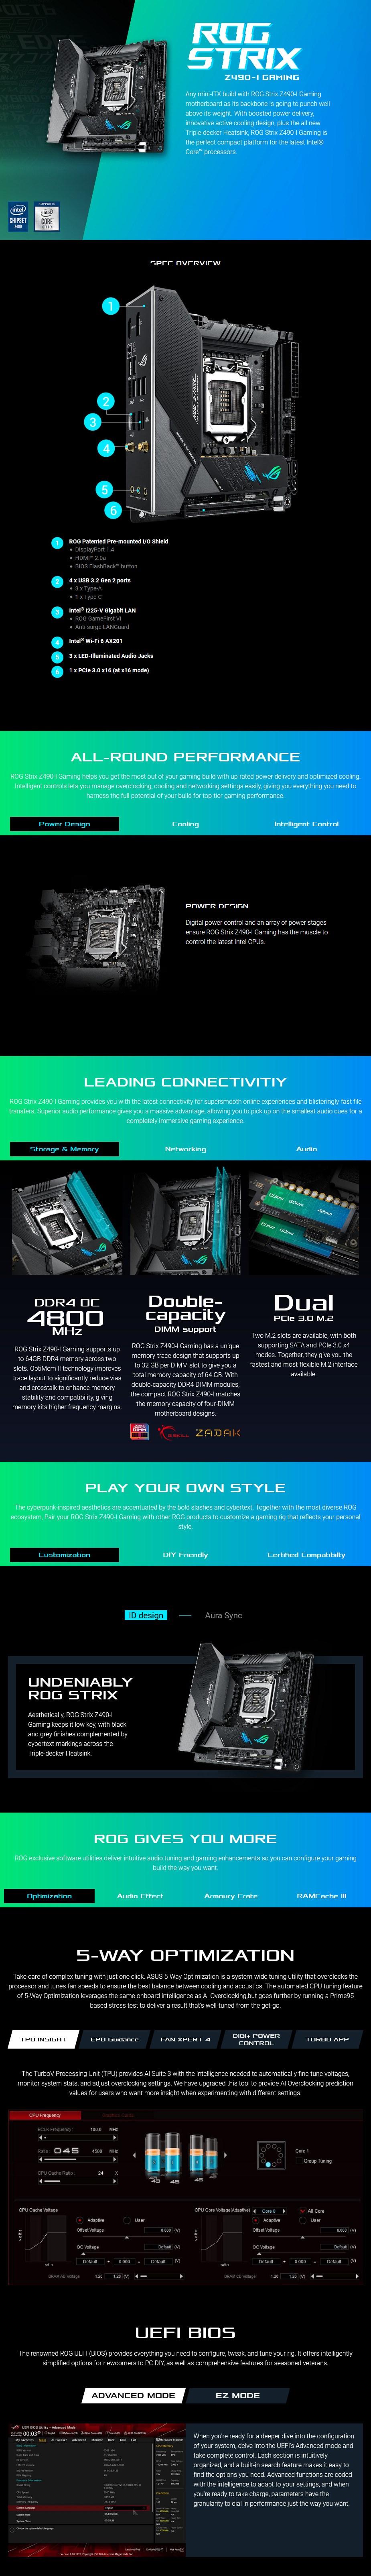 ASUS ROG STRIX Z490-I GAMING LGA 1200 Mini-ITX Motherboard - Overview 1